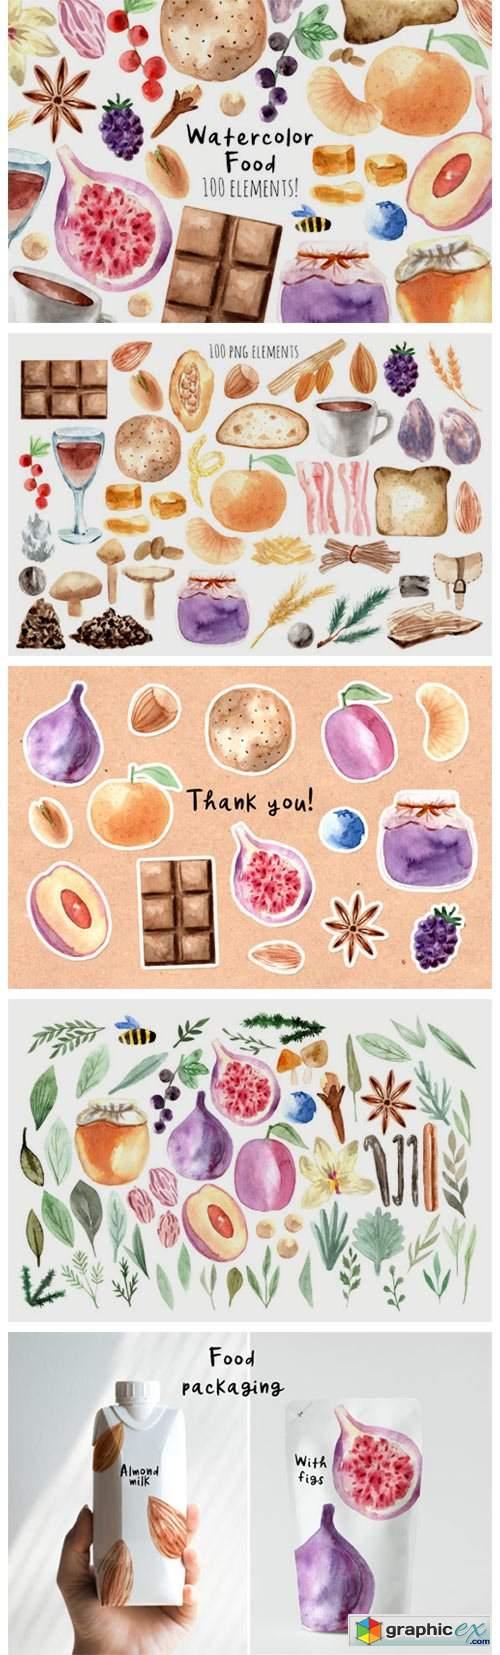 Watercolor Food. 100 Cliparts